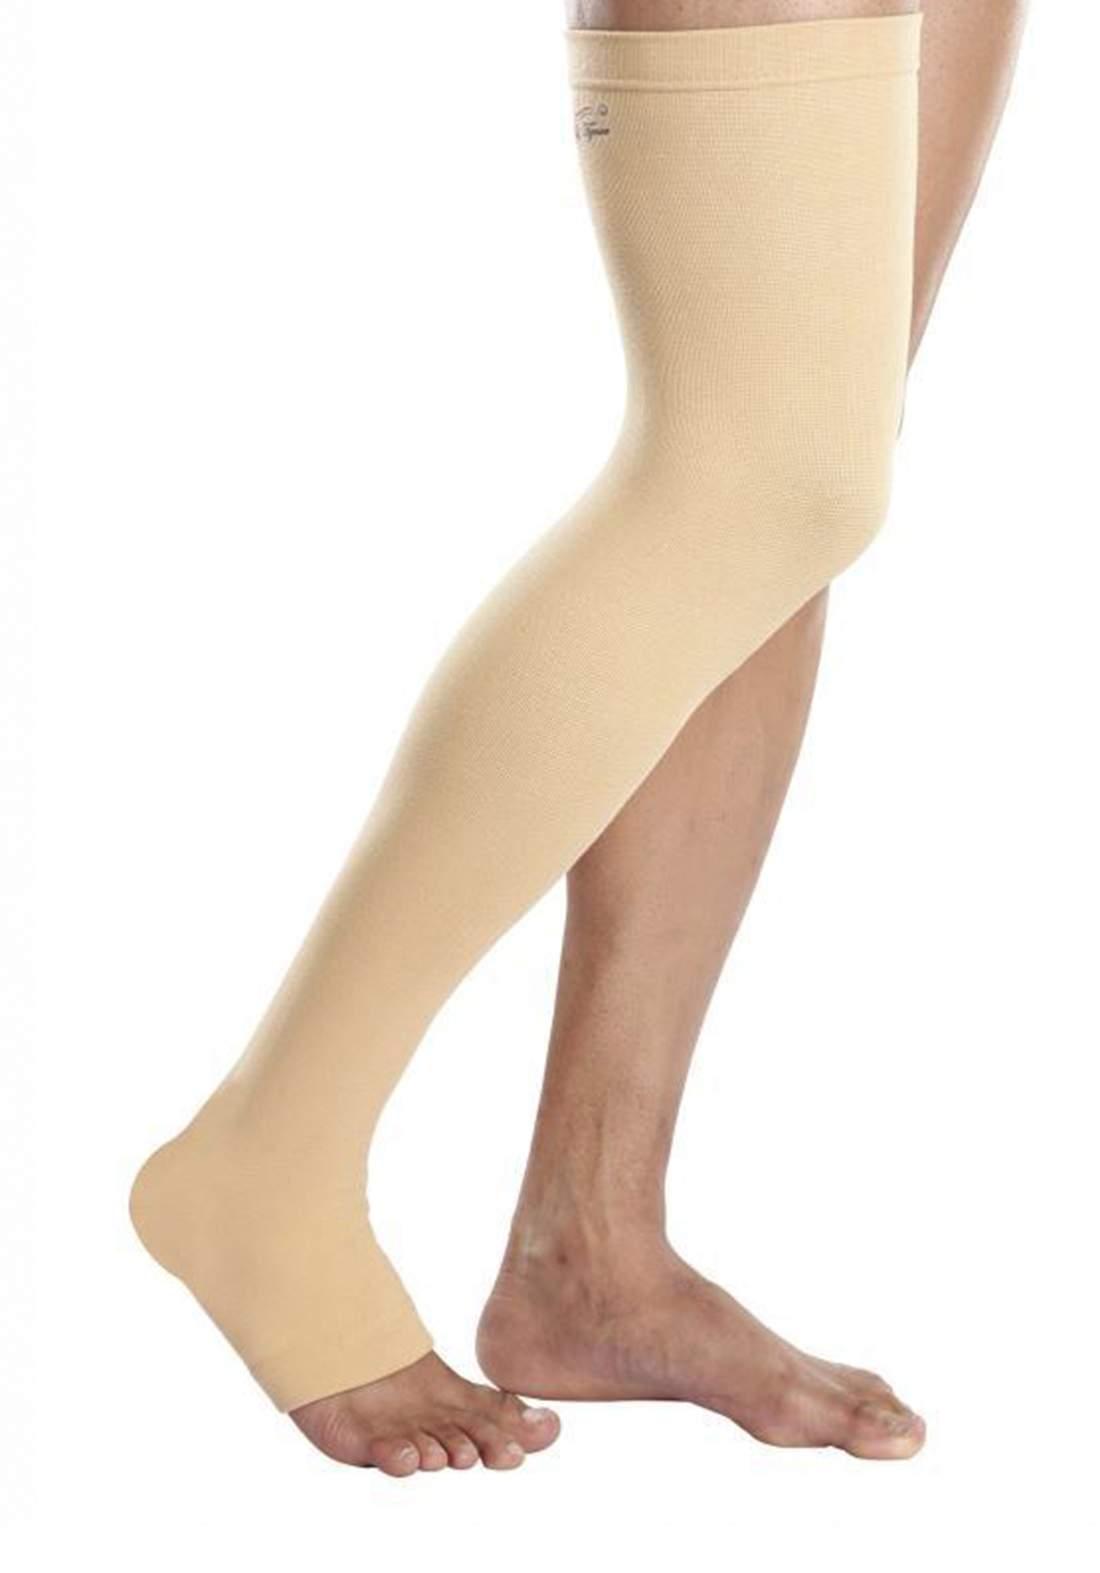 Tynor I-15 Mid Thigh Compression Stockings جوارب دوالي فوق الركبة